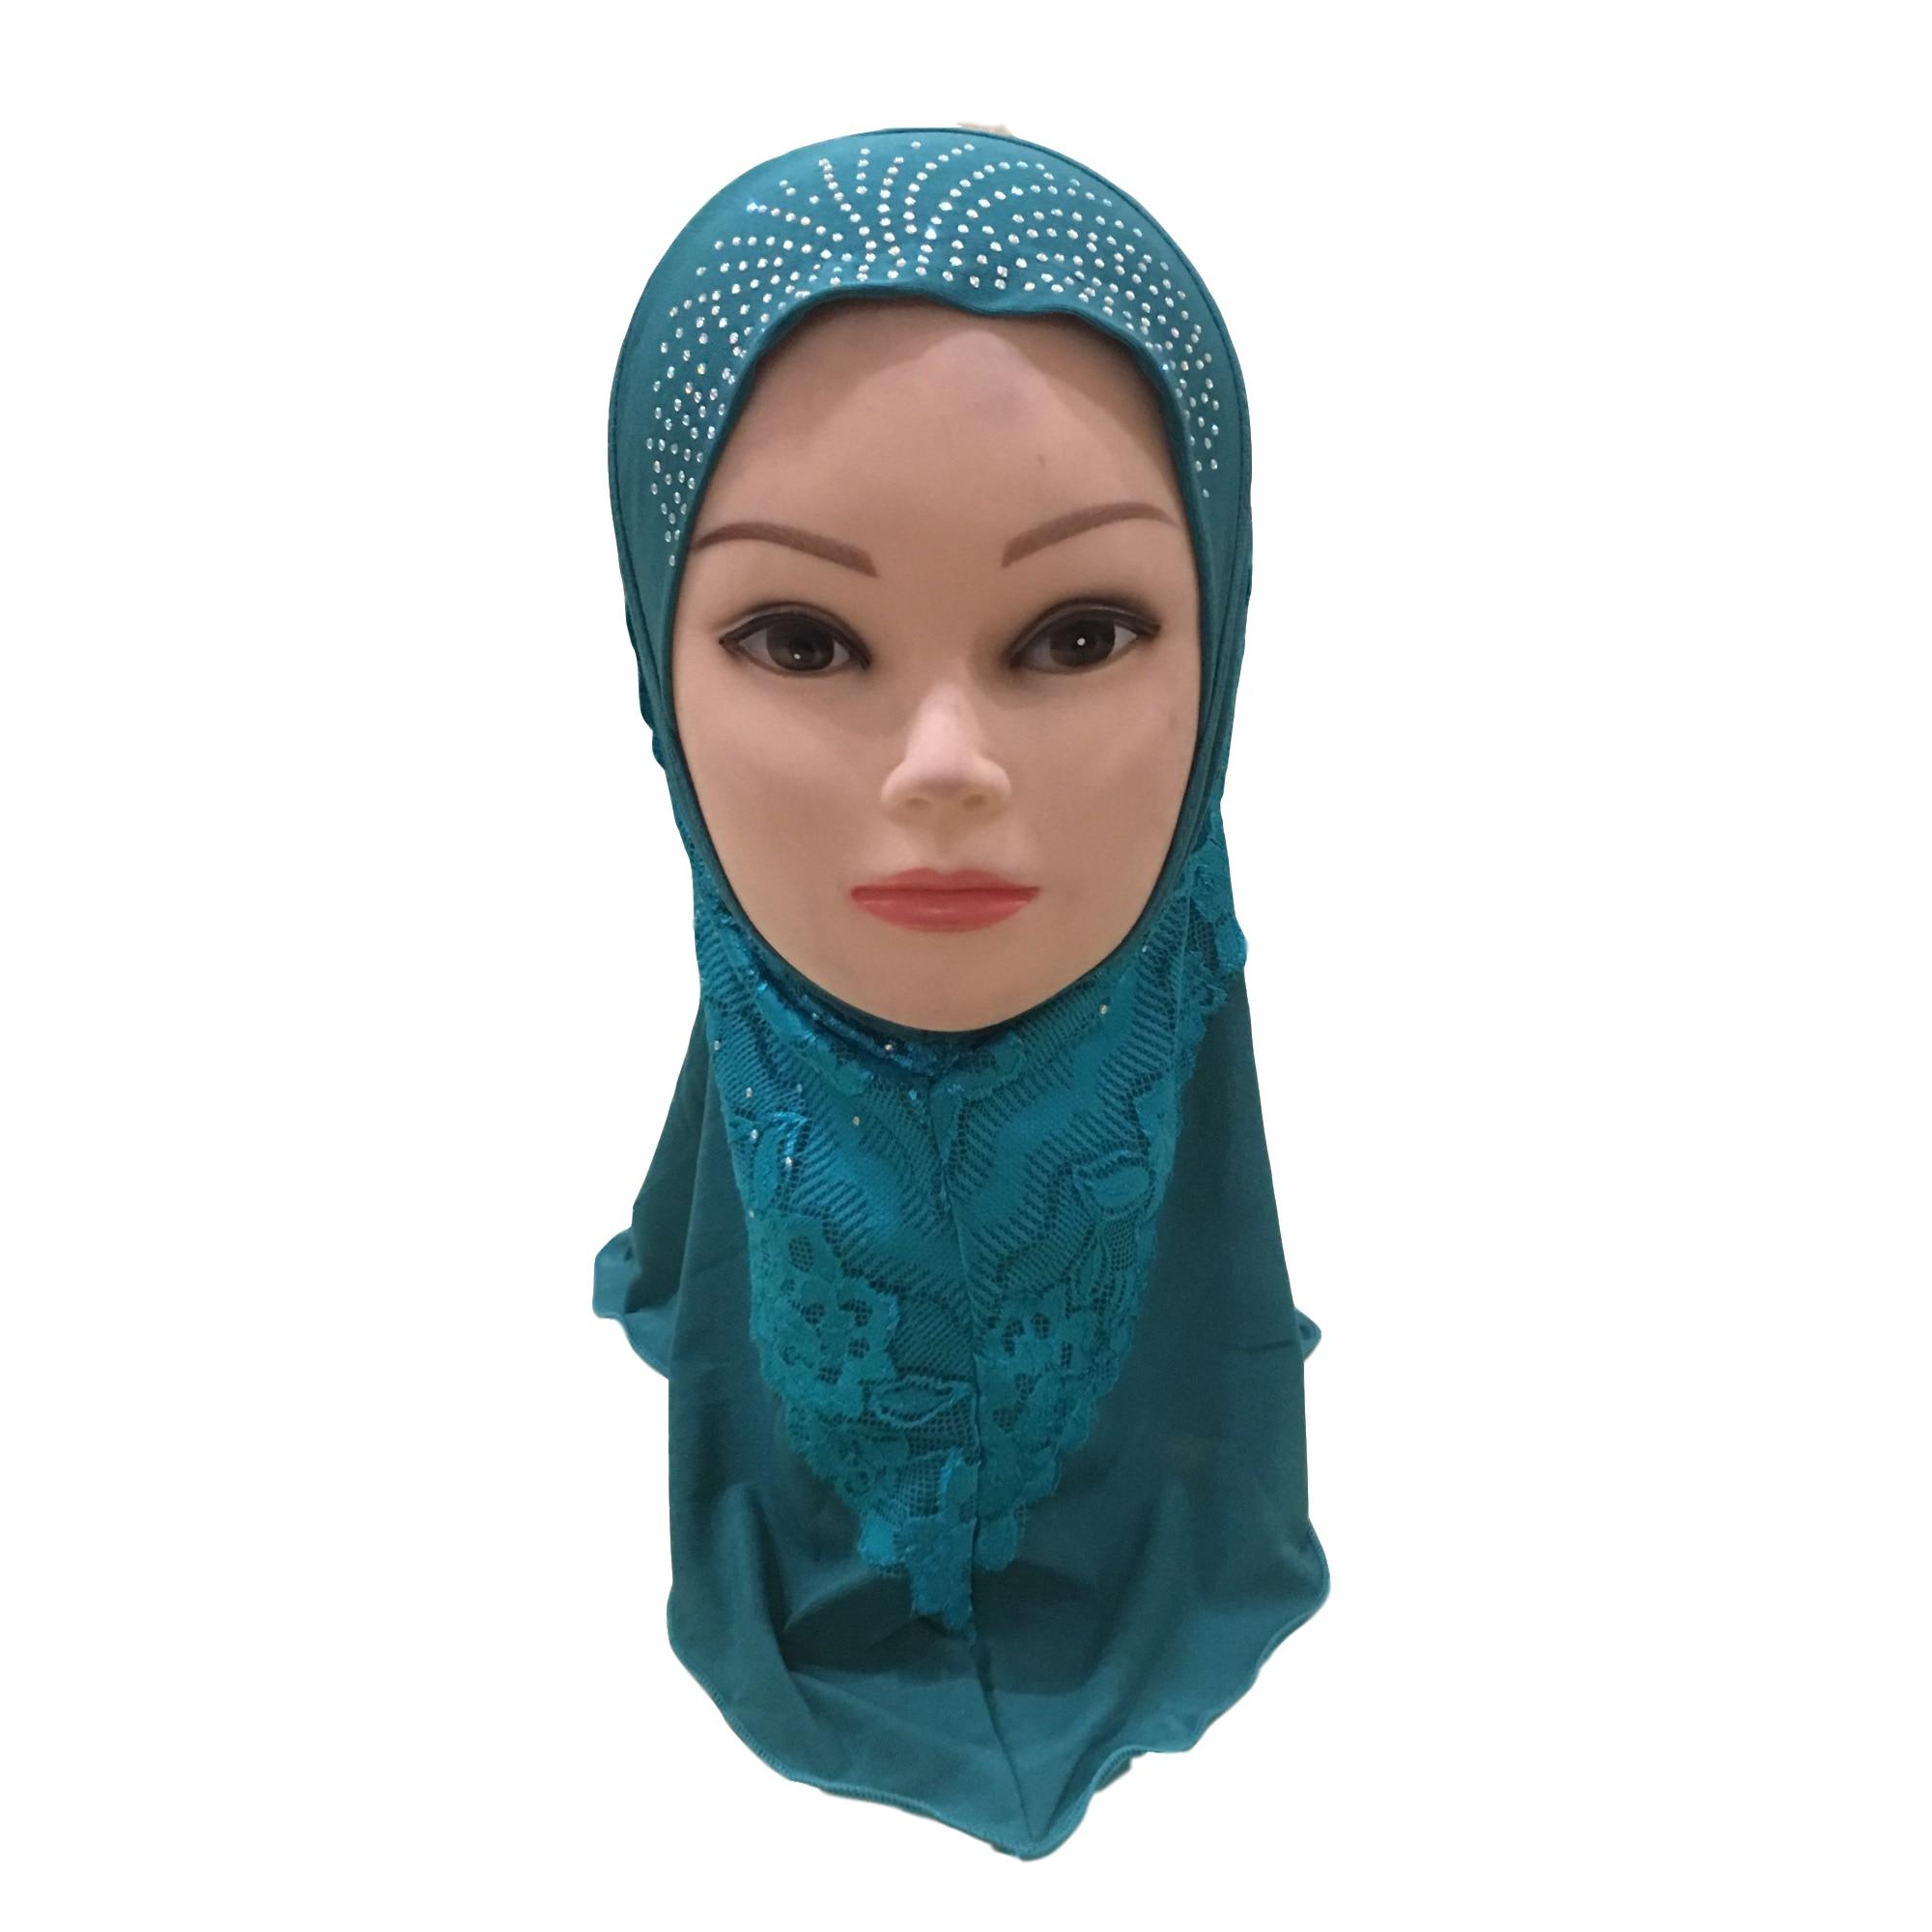 Image 4 - Muslim Girls Hijab Kids Hijab Islamic Fashion Scarf Shawls with  Beautiful Lace Diamond WholesaleIslamic Clothing